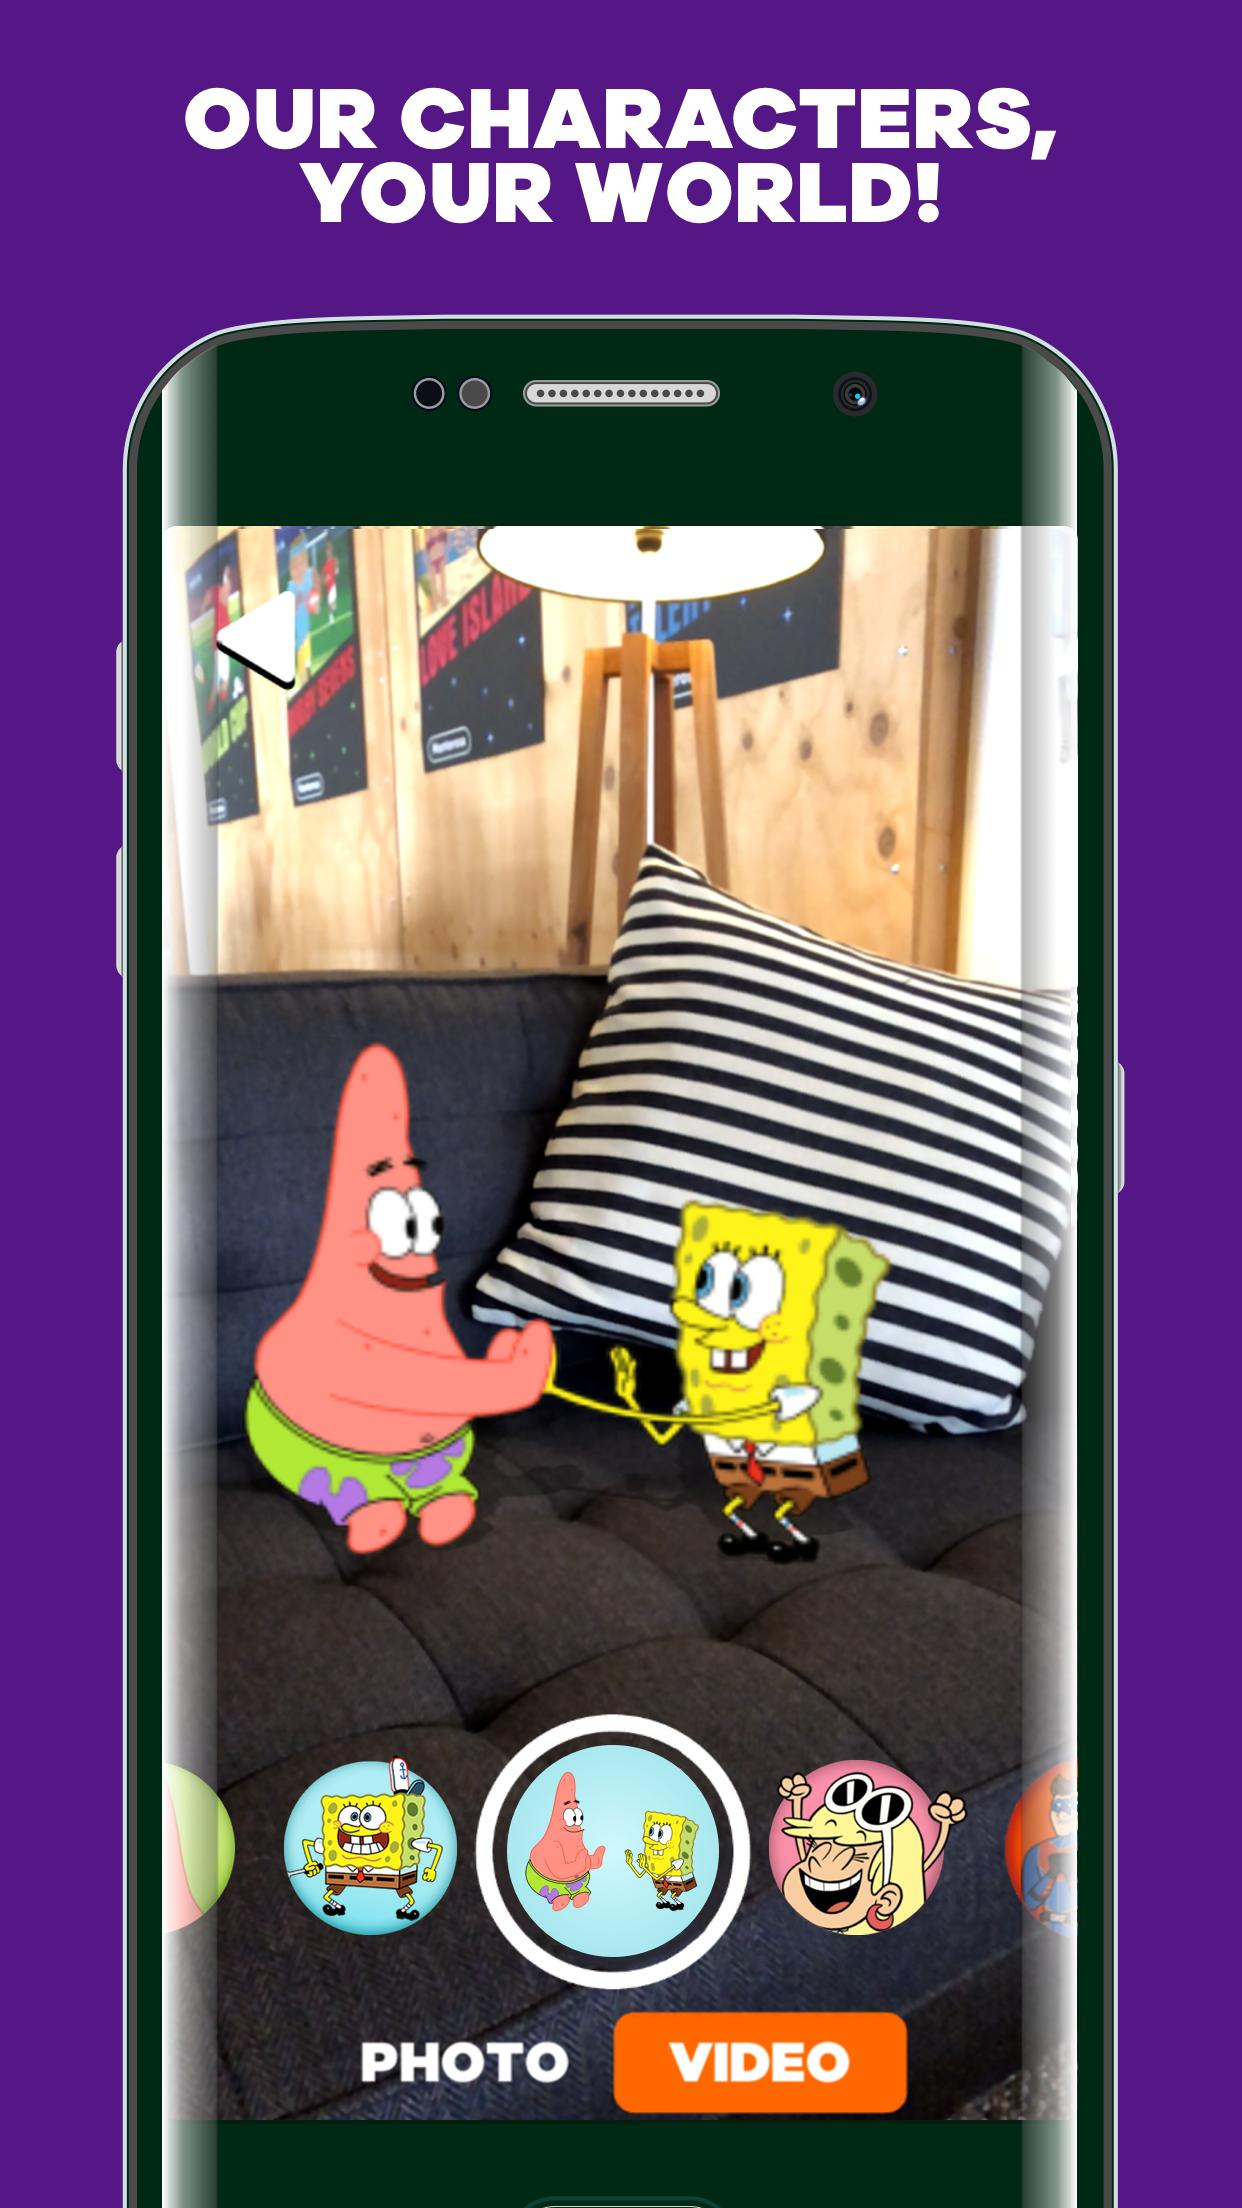 SCREENS UP by Nickelodeon 6.1.1763 Screenshot 2